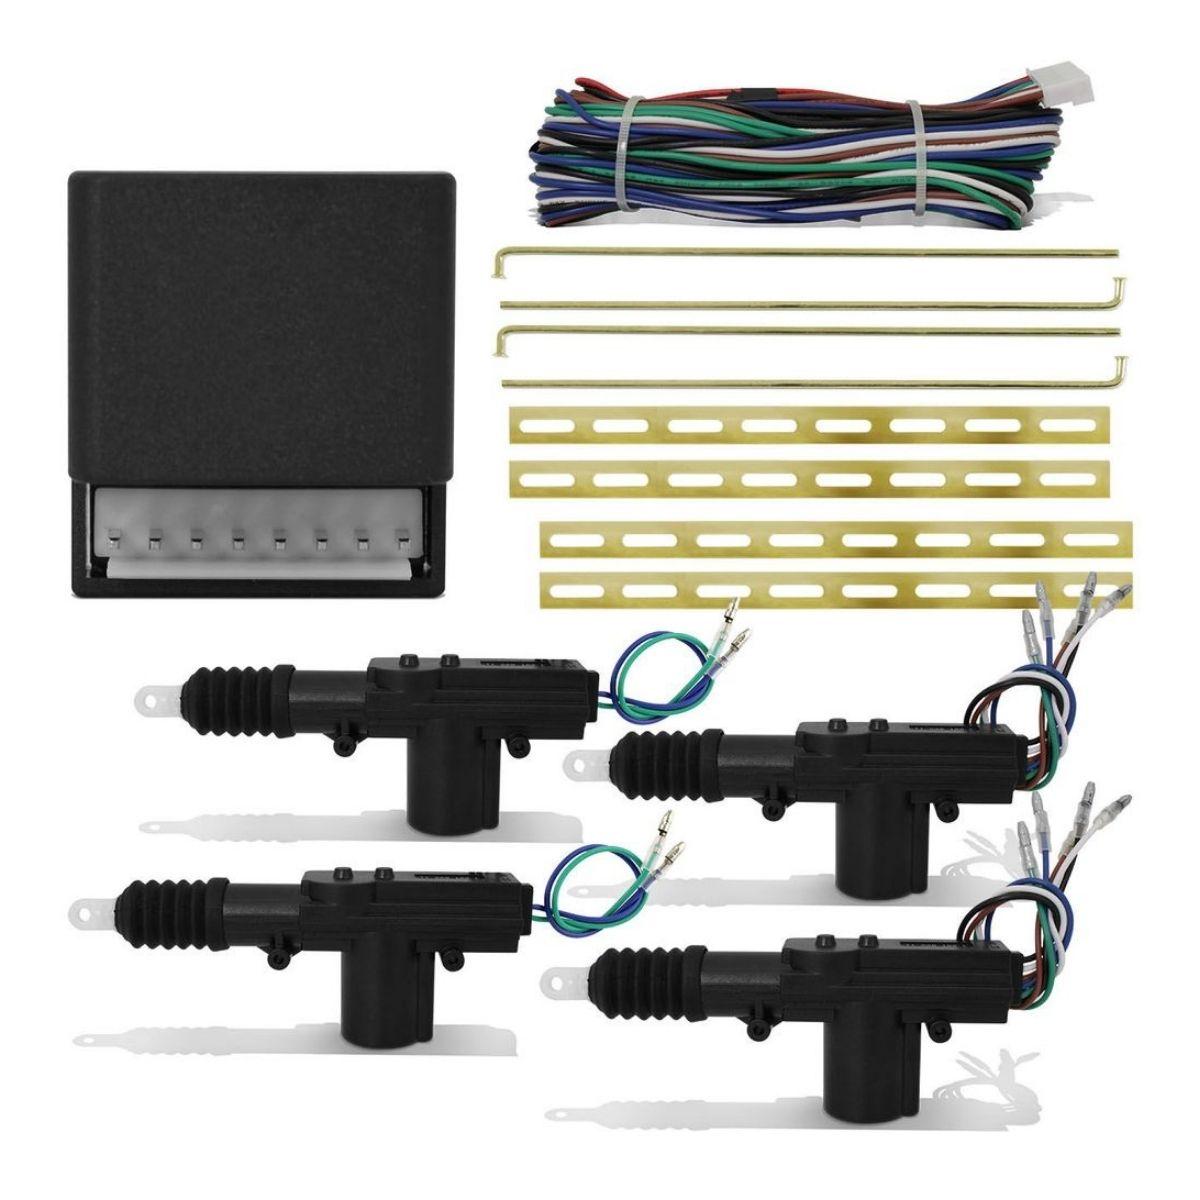 Kit Trava Elétrica Universal 4 Portas Dupla Serventia